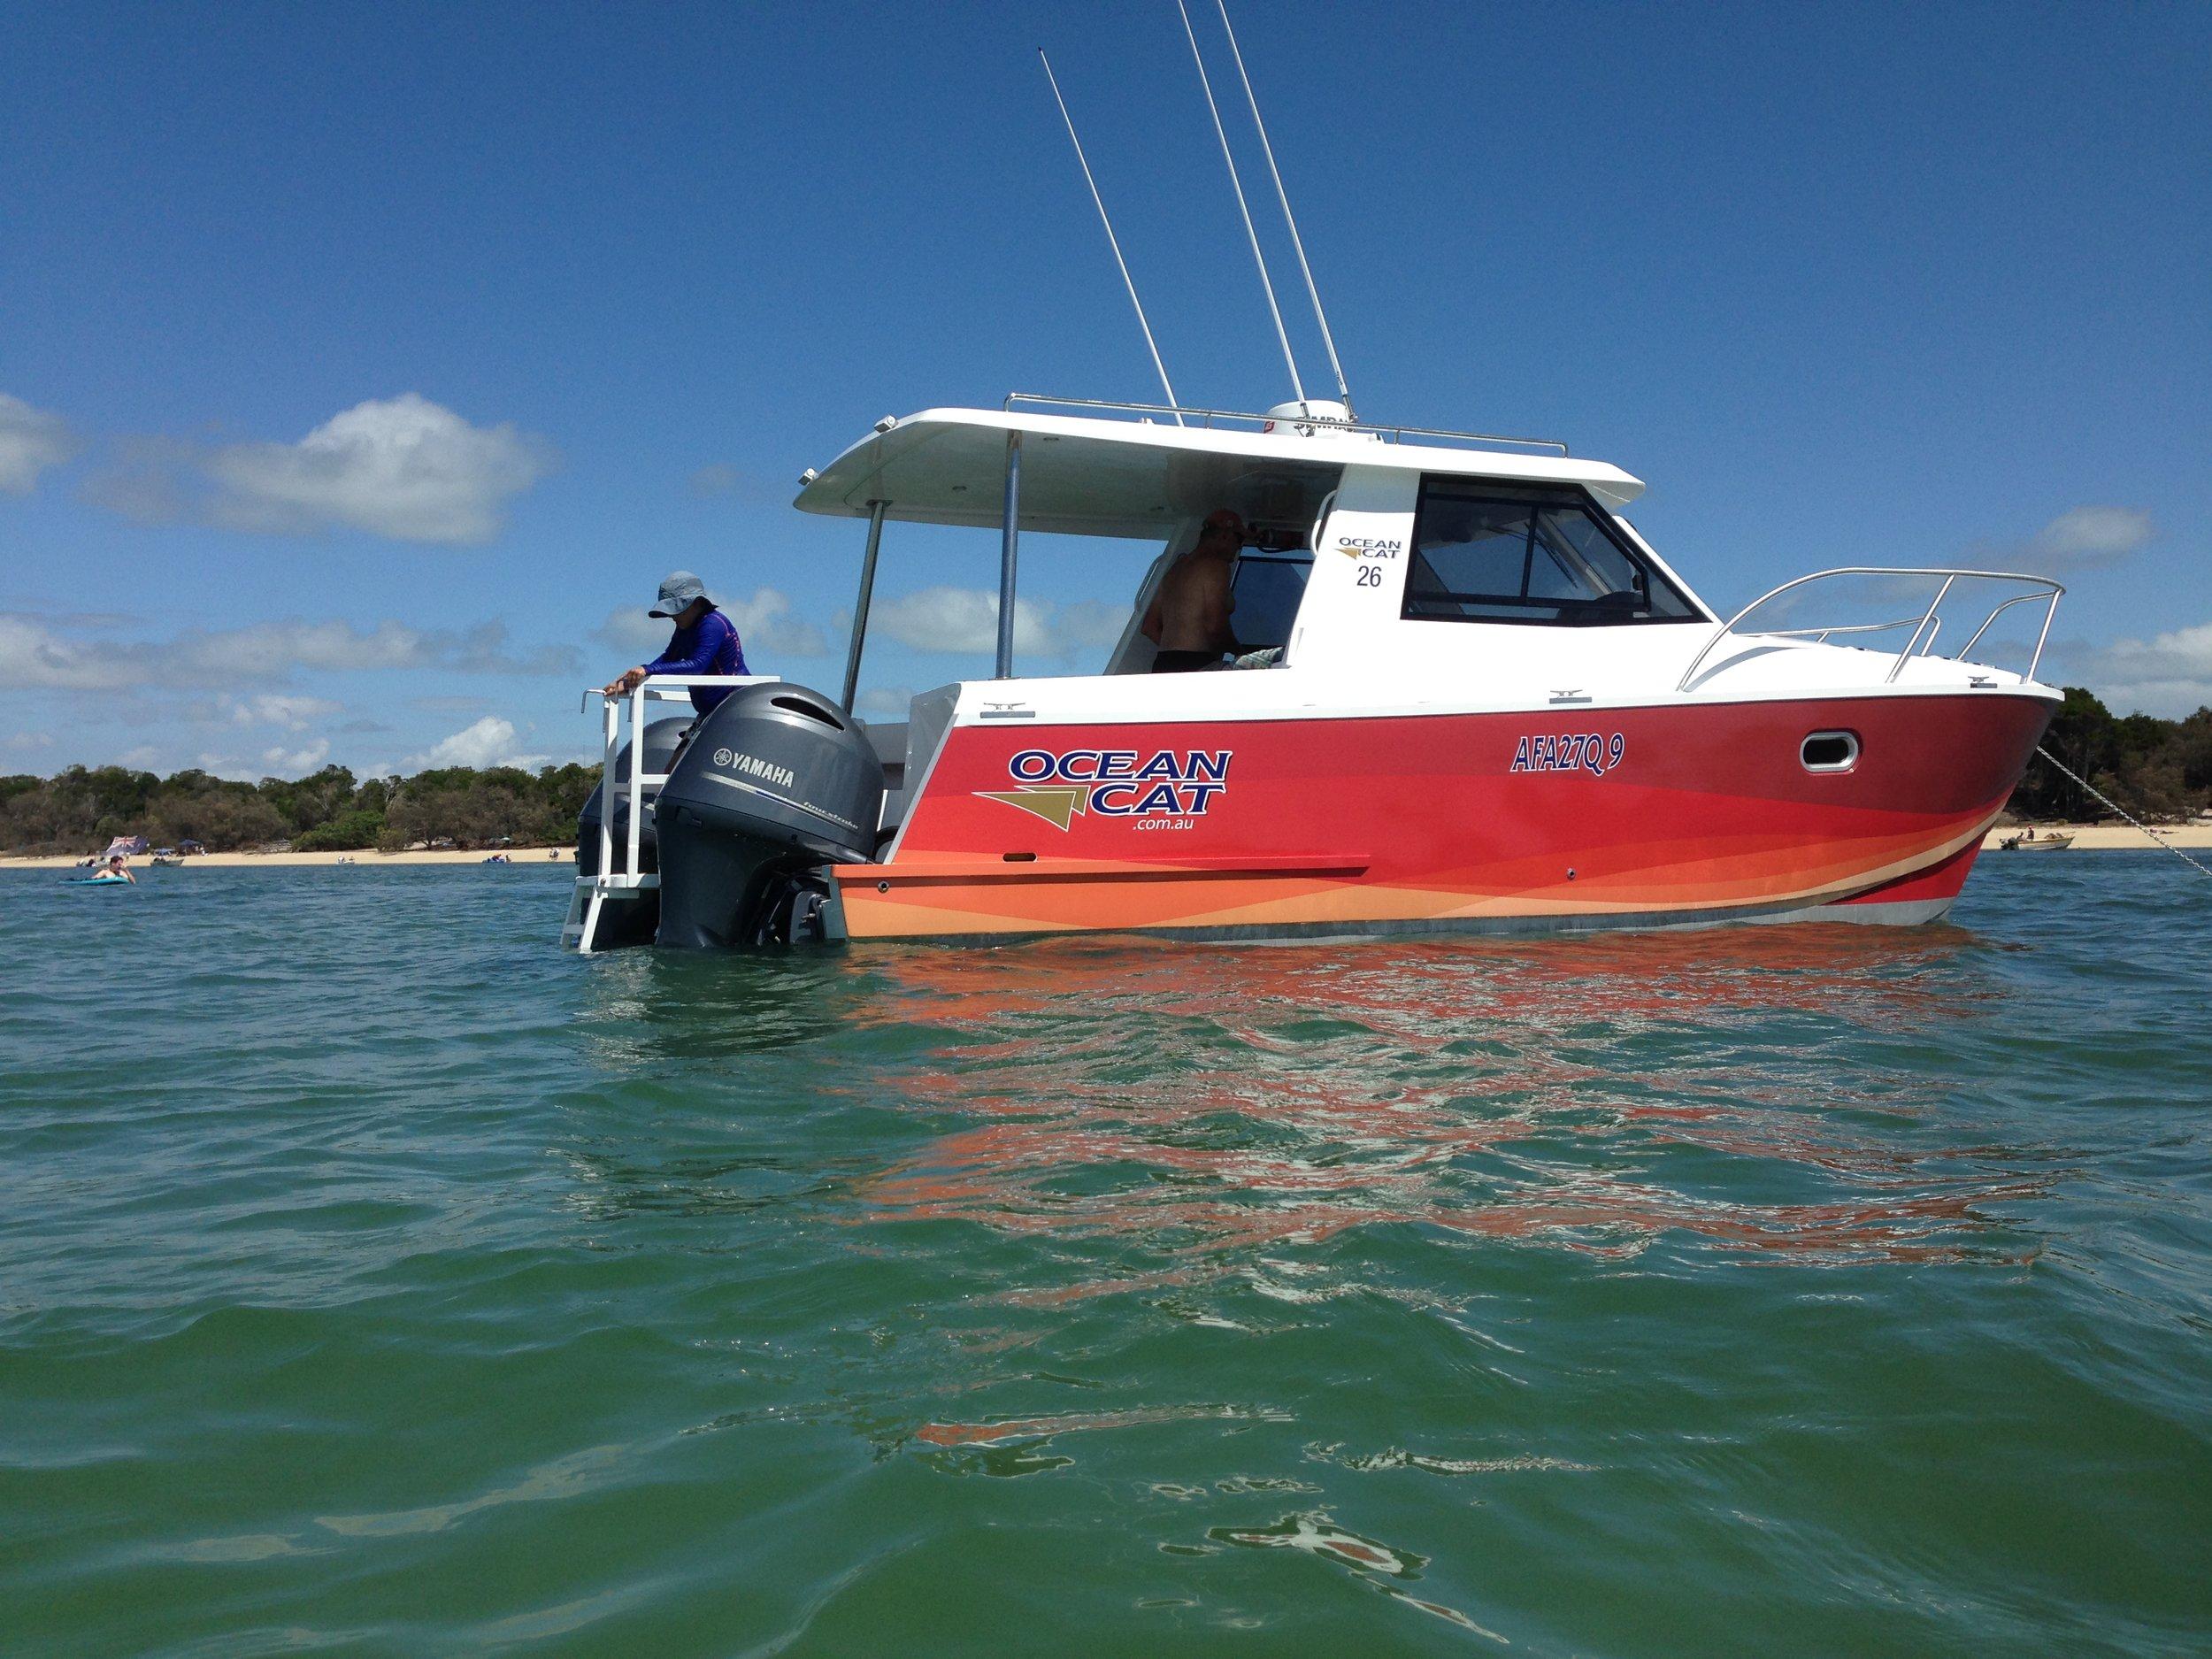 Family enjoying the beautiful waters of Moreton Bay